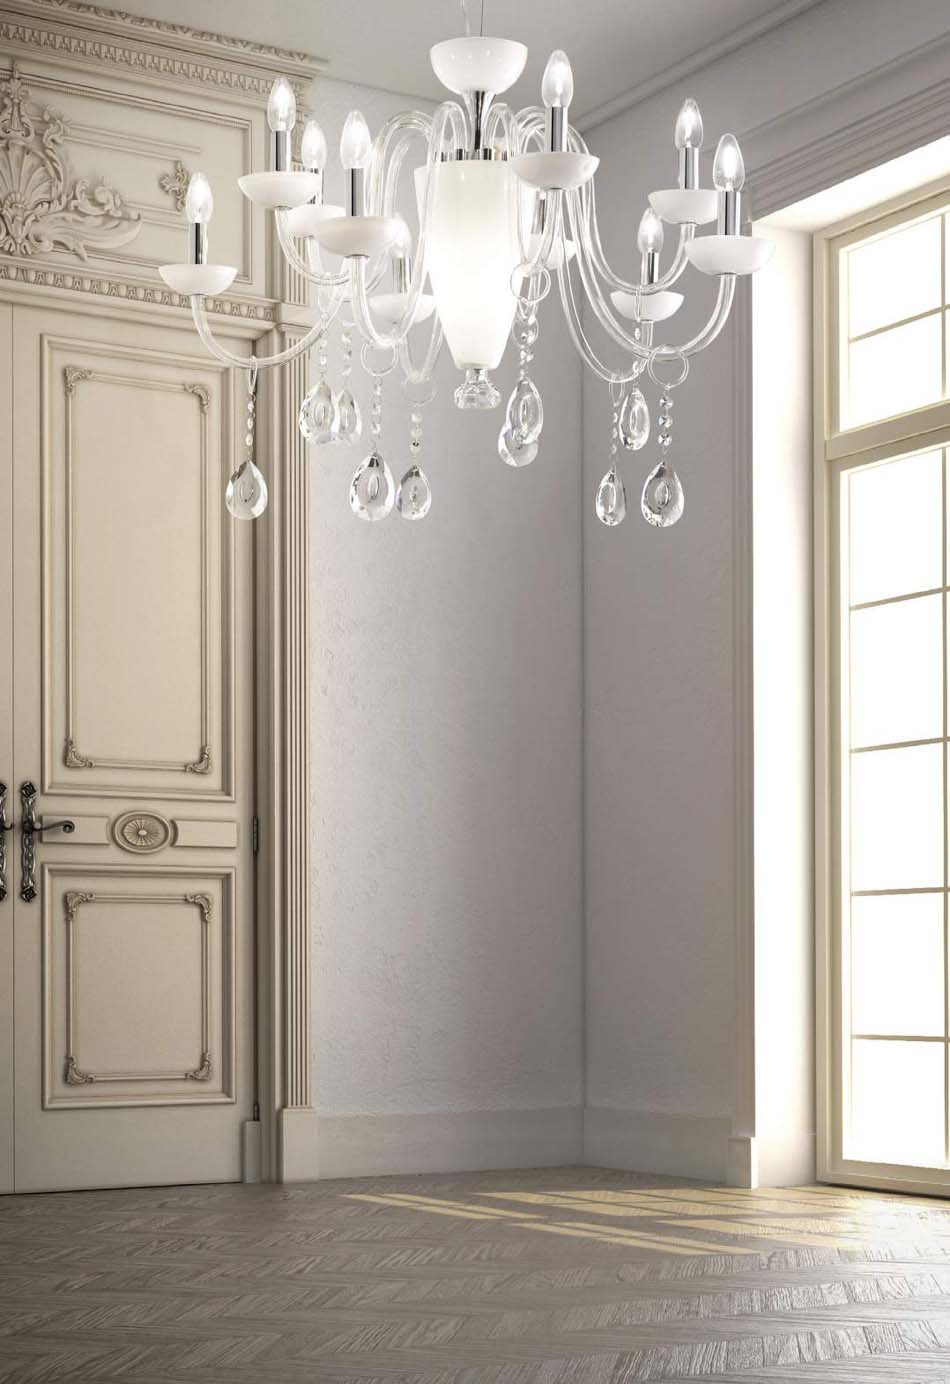 Lampade 36 sospese Ideal Lux Camelia – Toscana Arredamenti